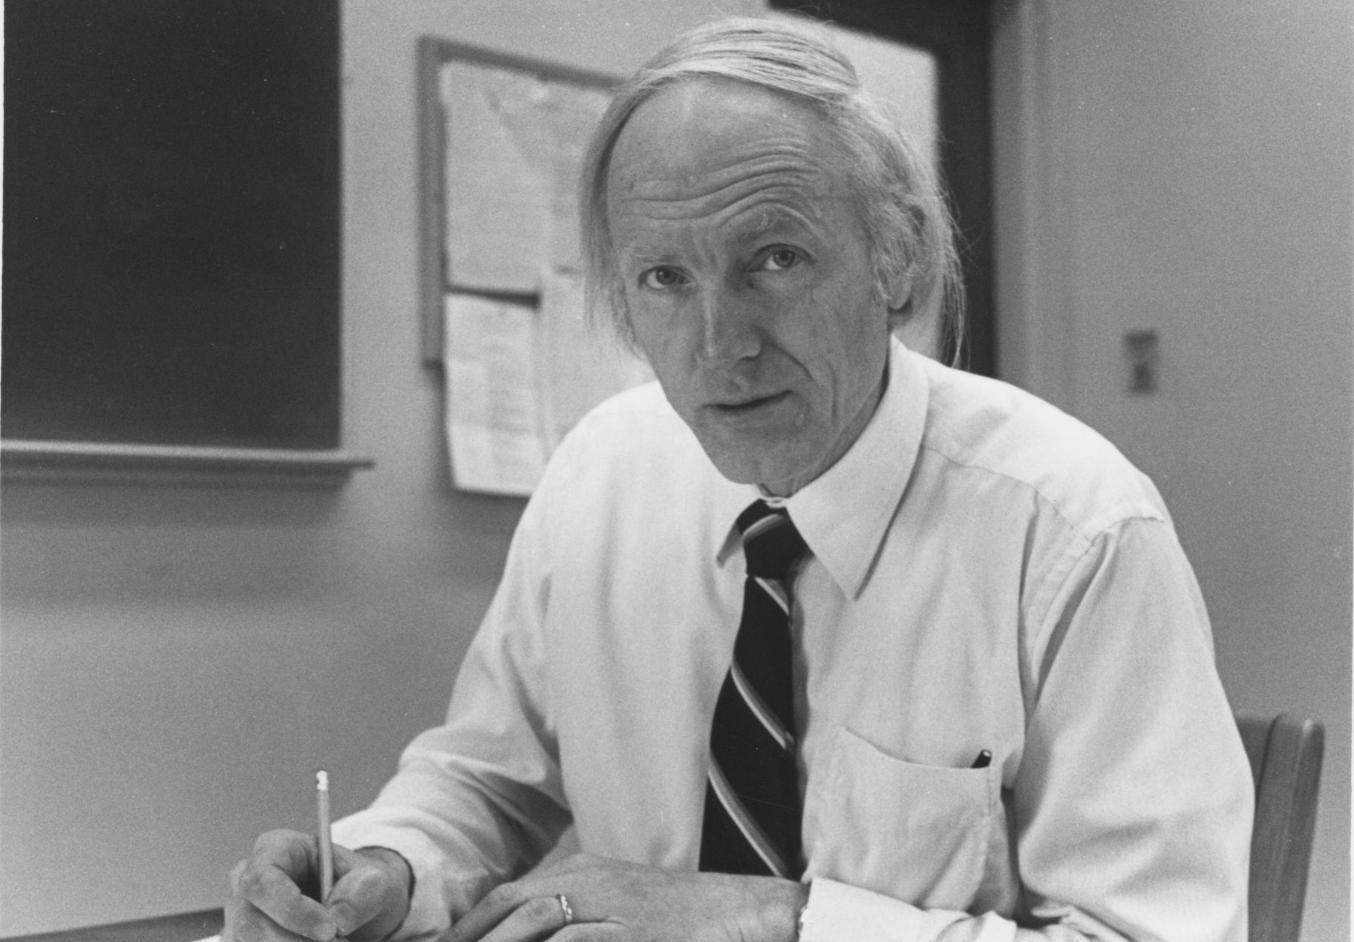 Alan S. Foss